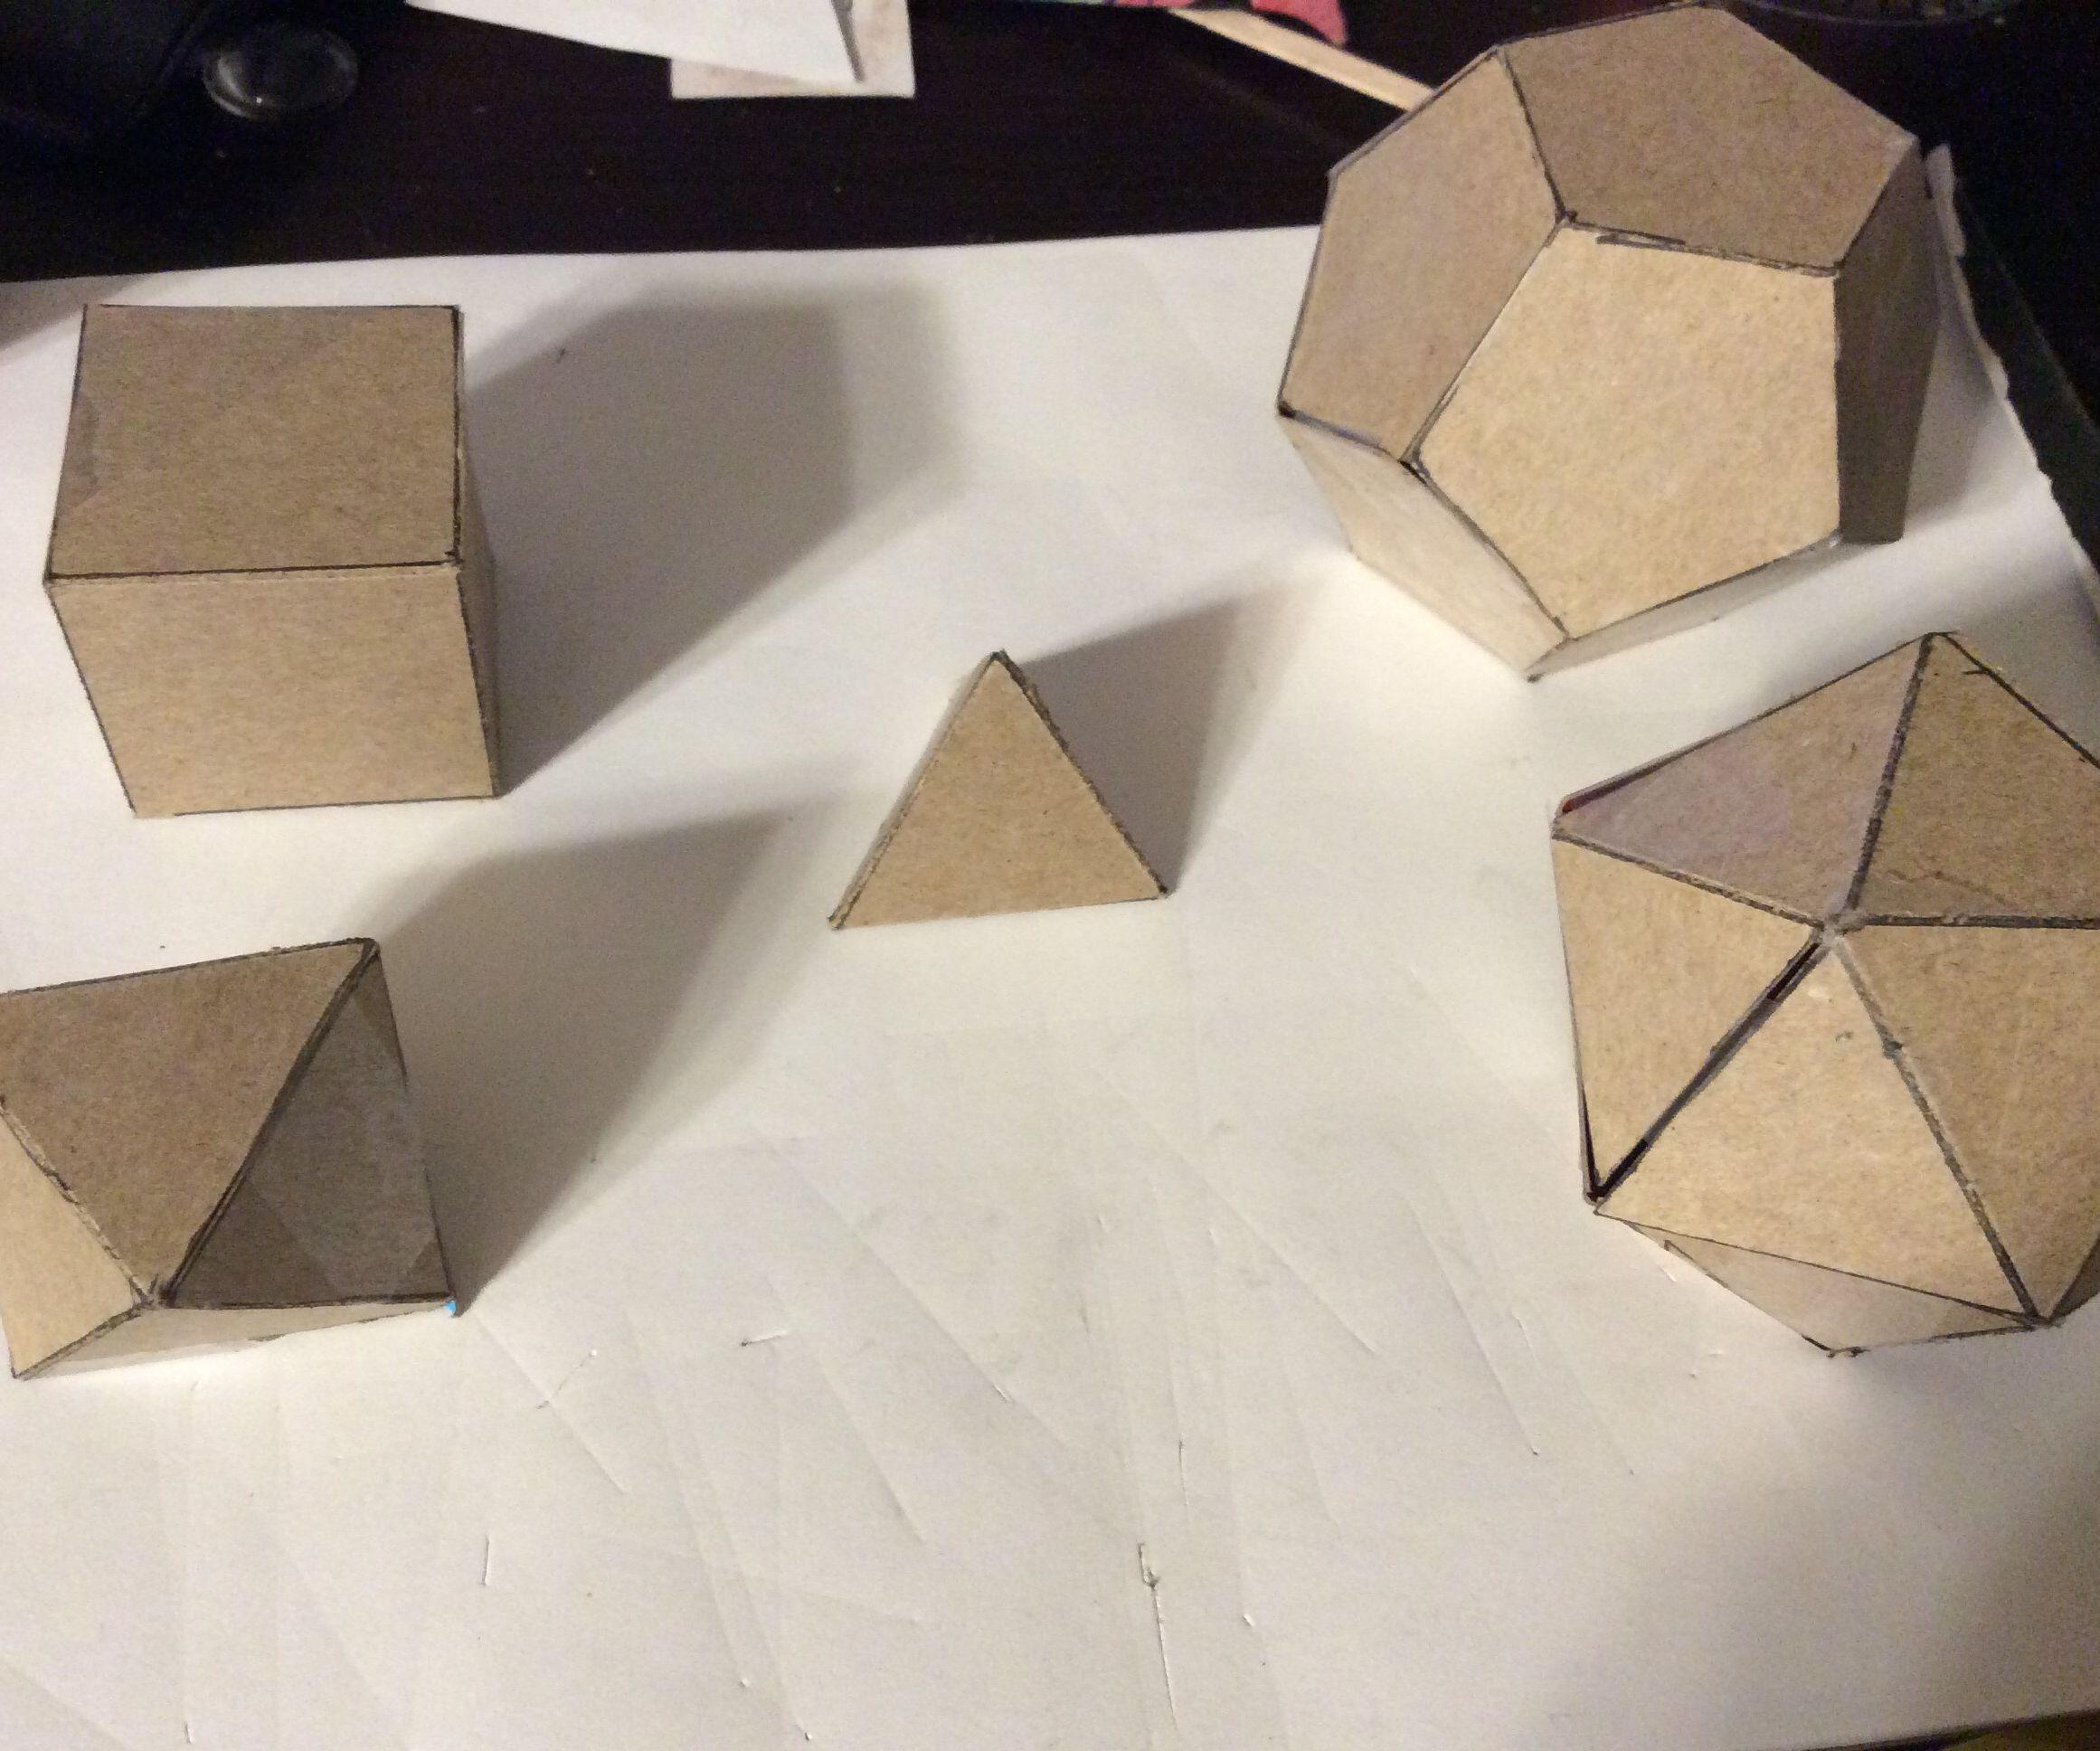 Cereal Box Platonic Solids